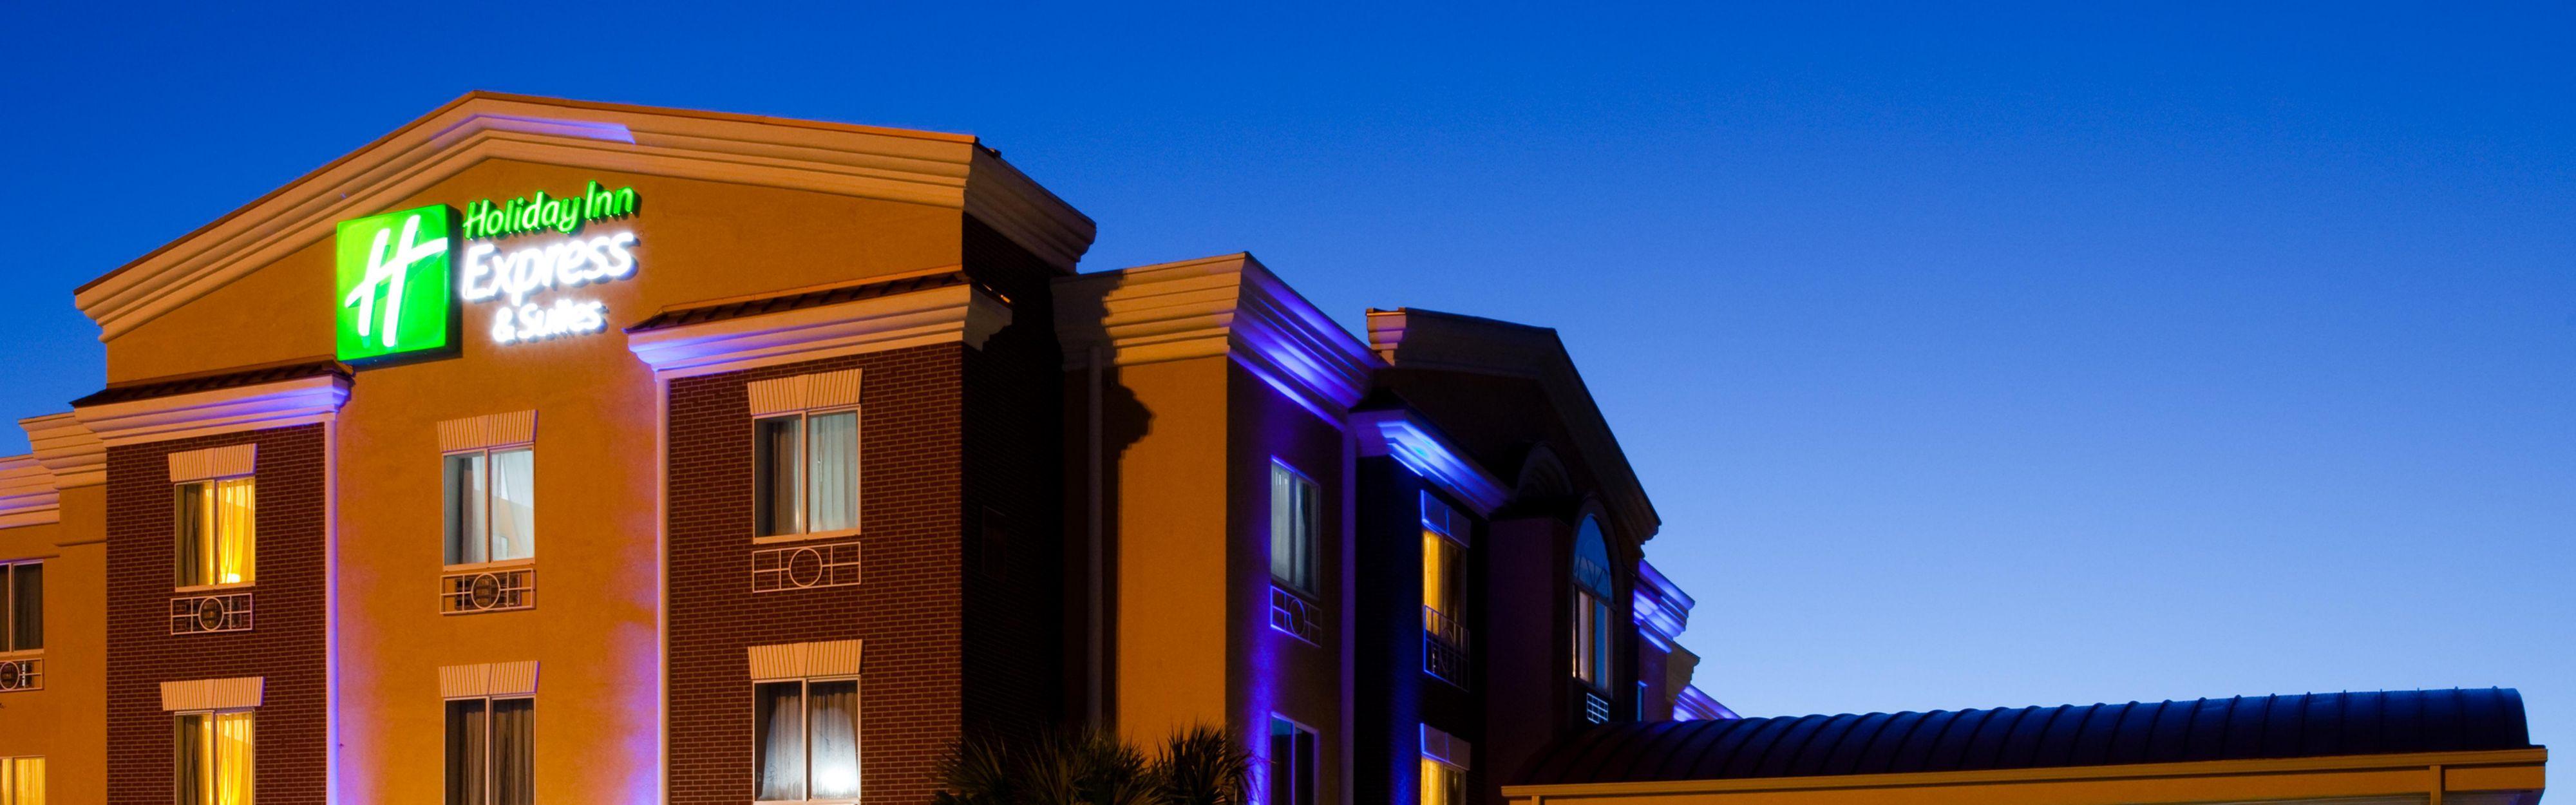 Holiday Inn Express Brooksville-I-75 image 0